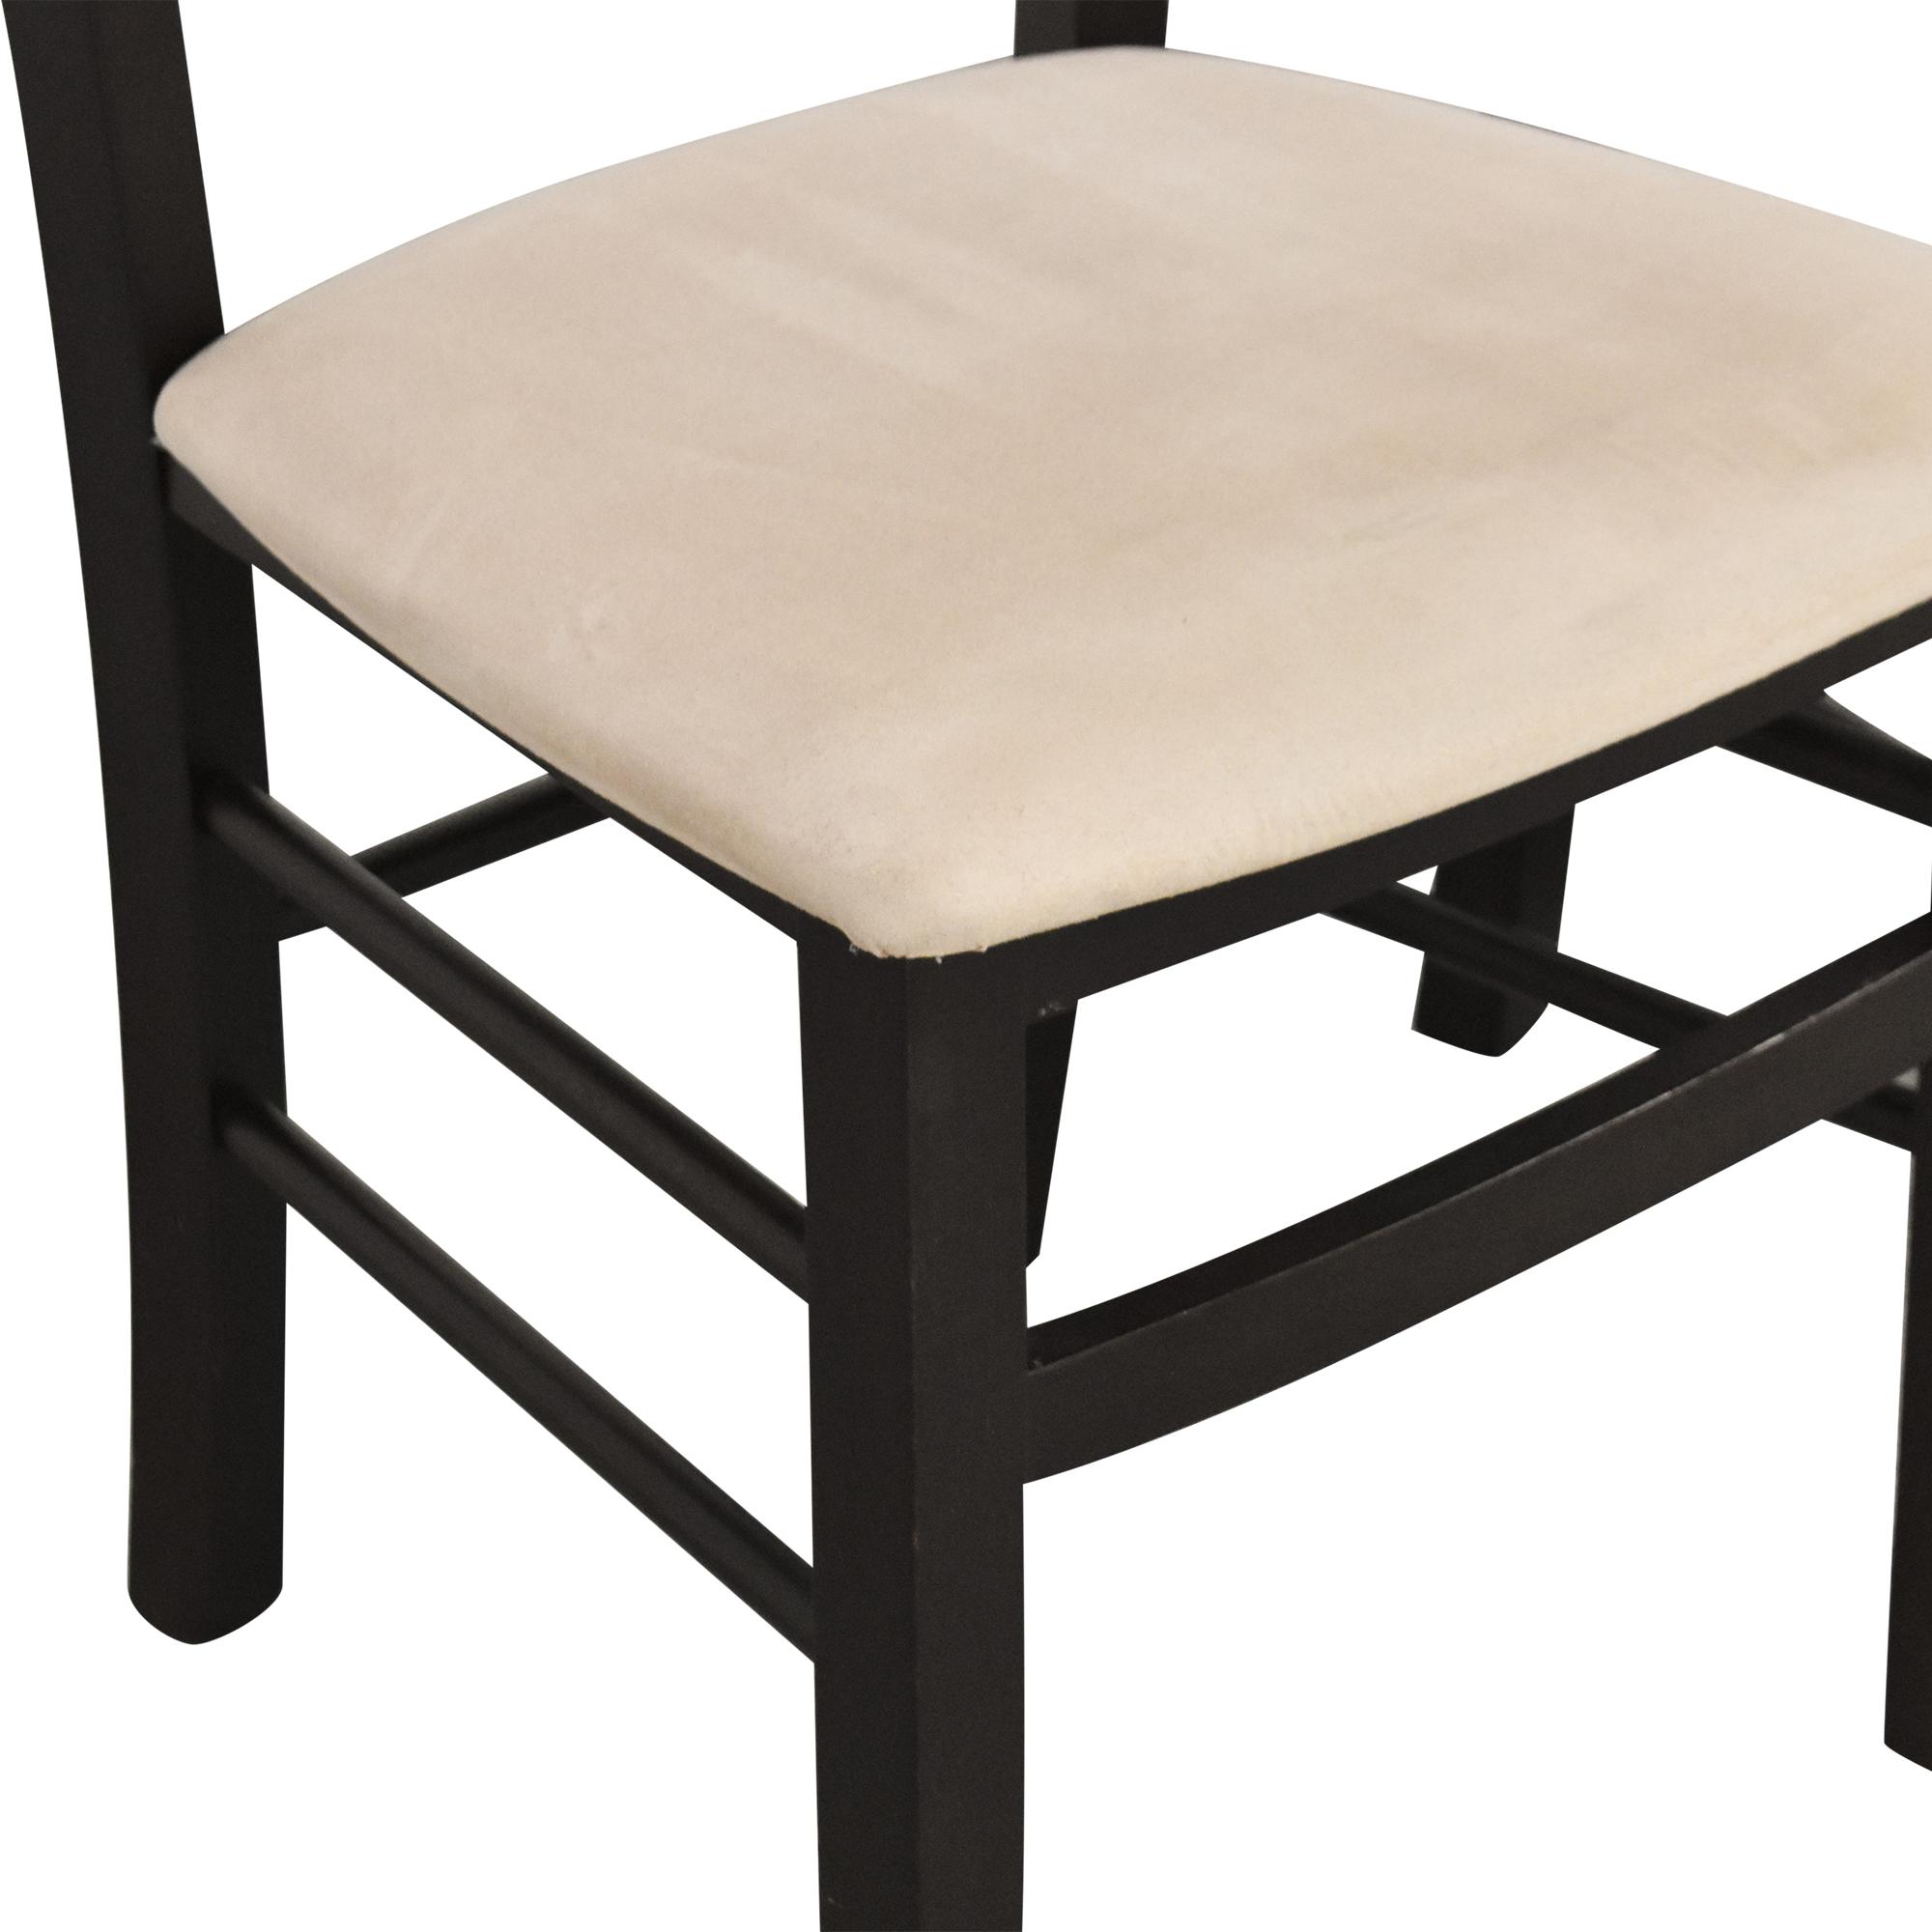 Calligaris Calligaris Dining Chairs coupon